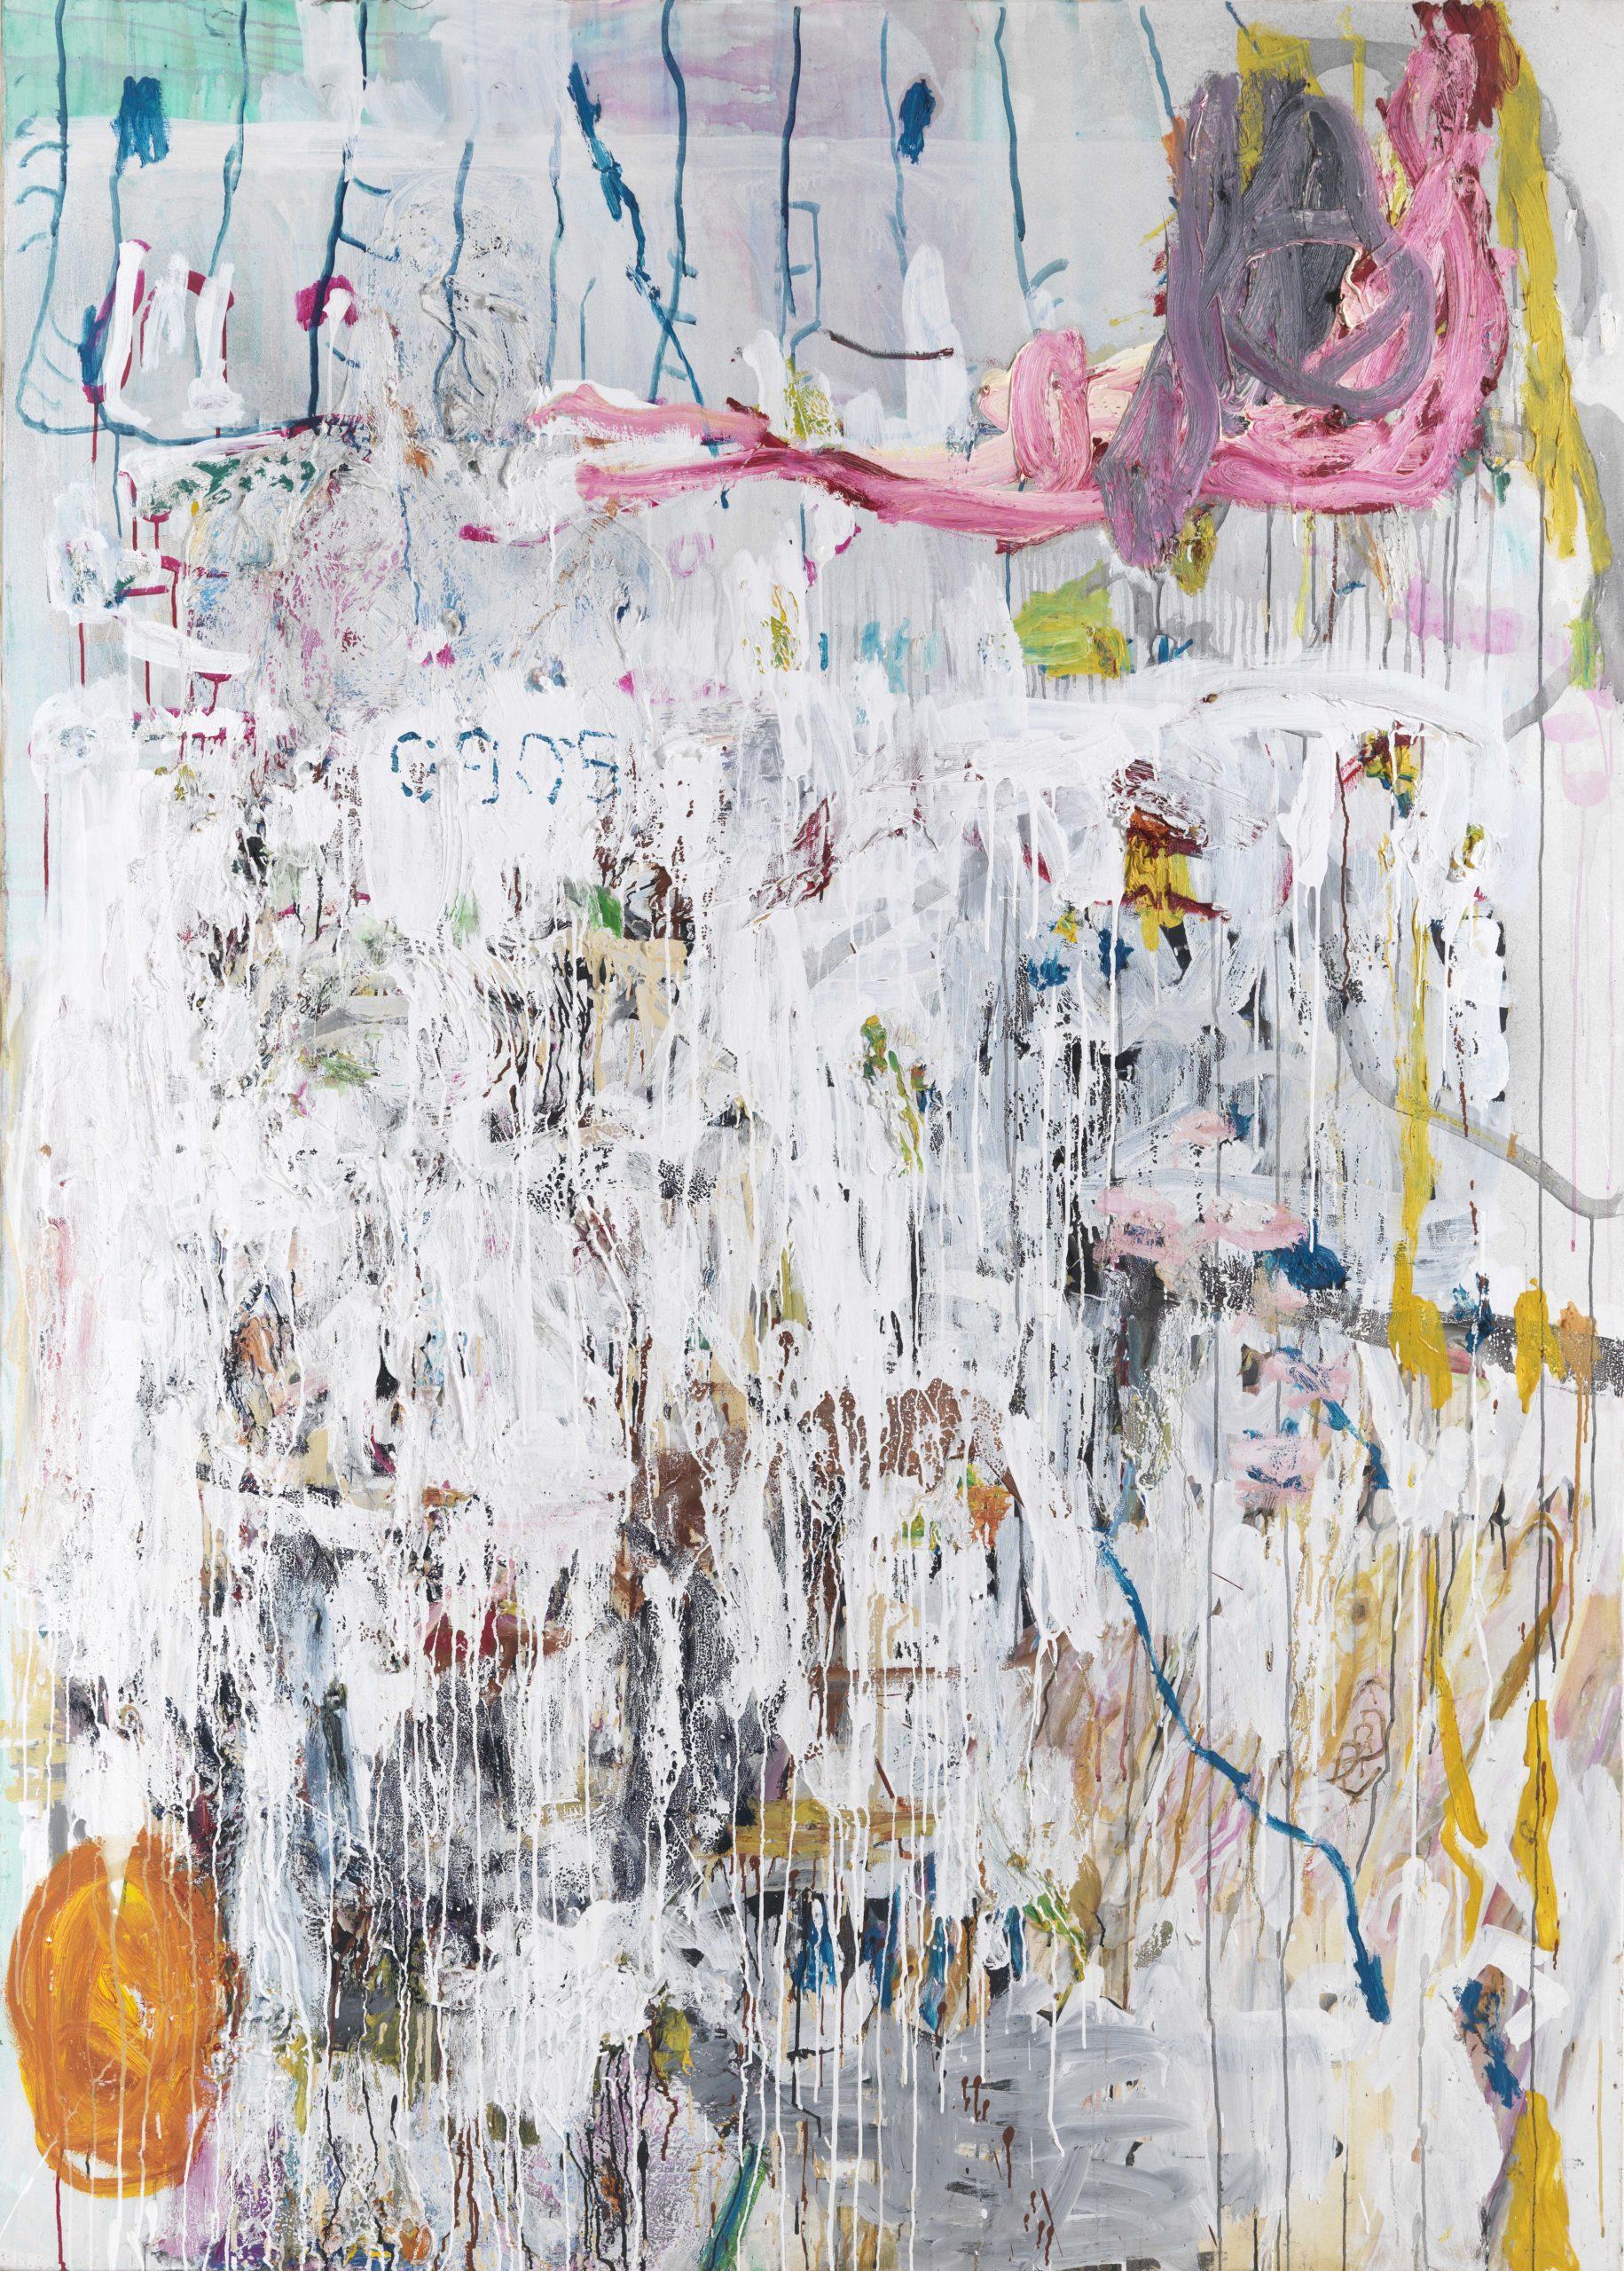 Reinhard Pods, Ohne Titel, 2005, Öl auf Leinwand, 230,6 x 164,8 cm